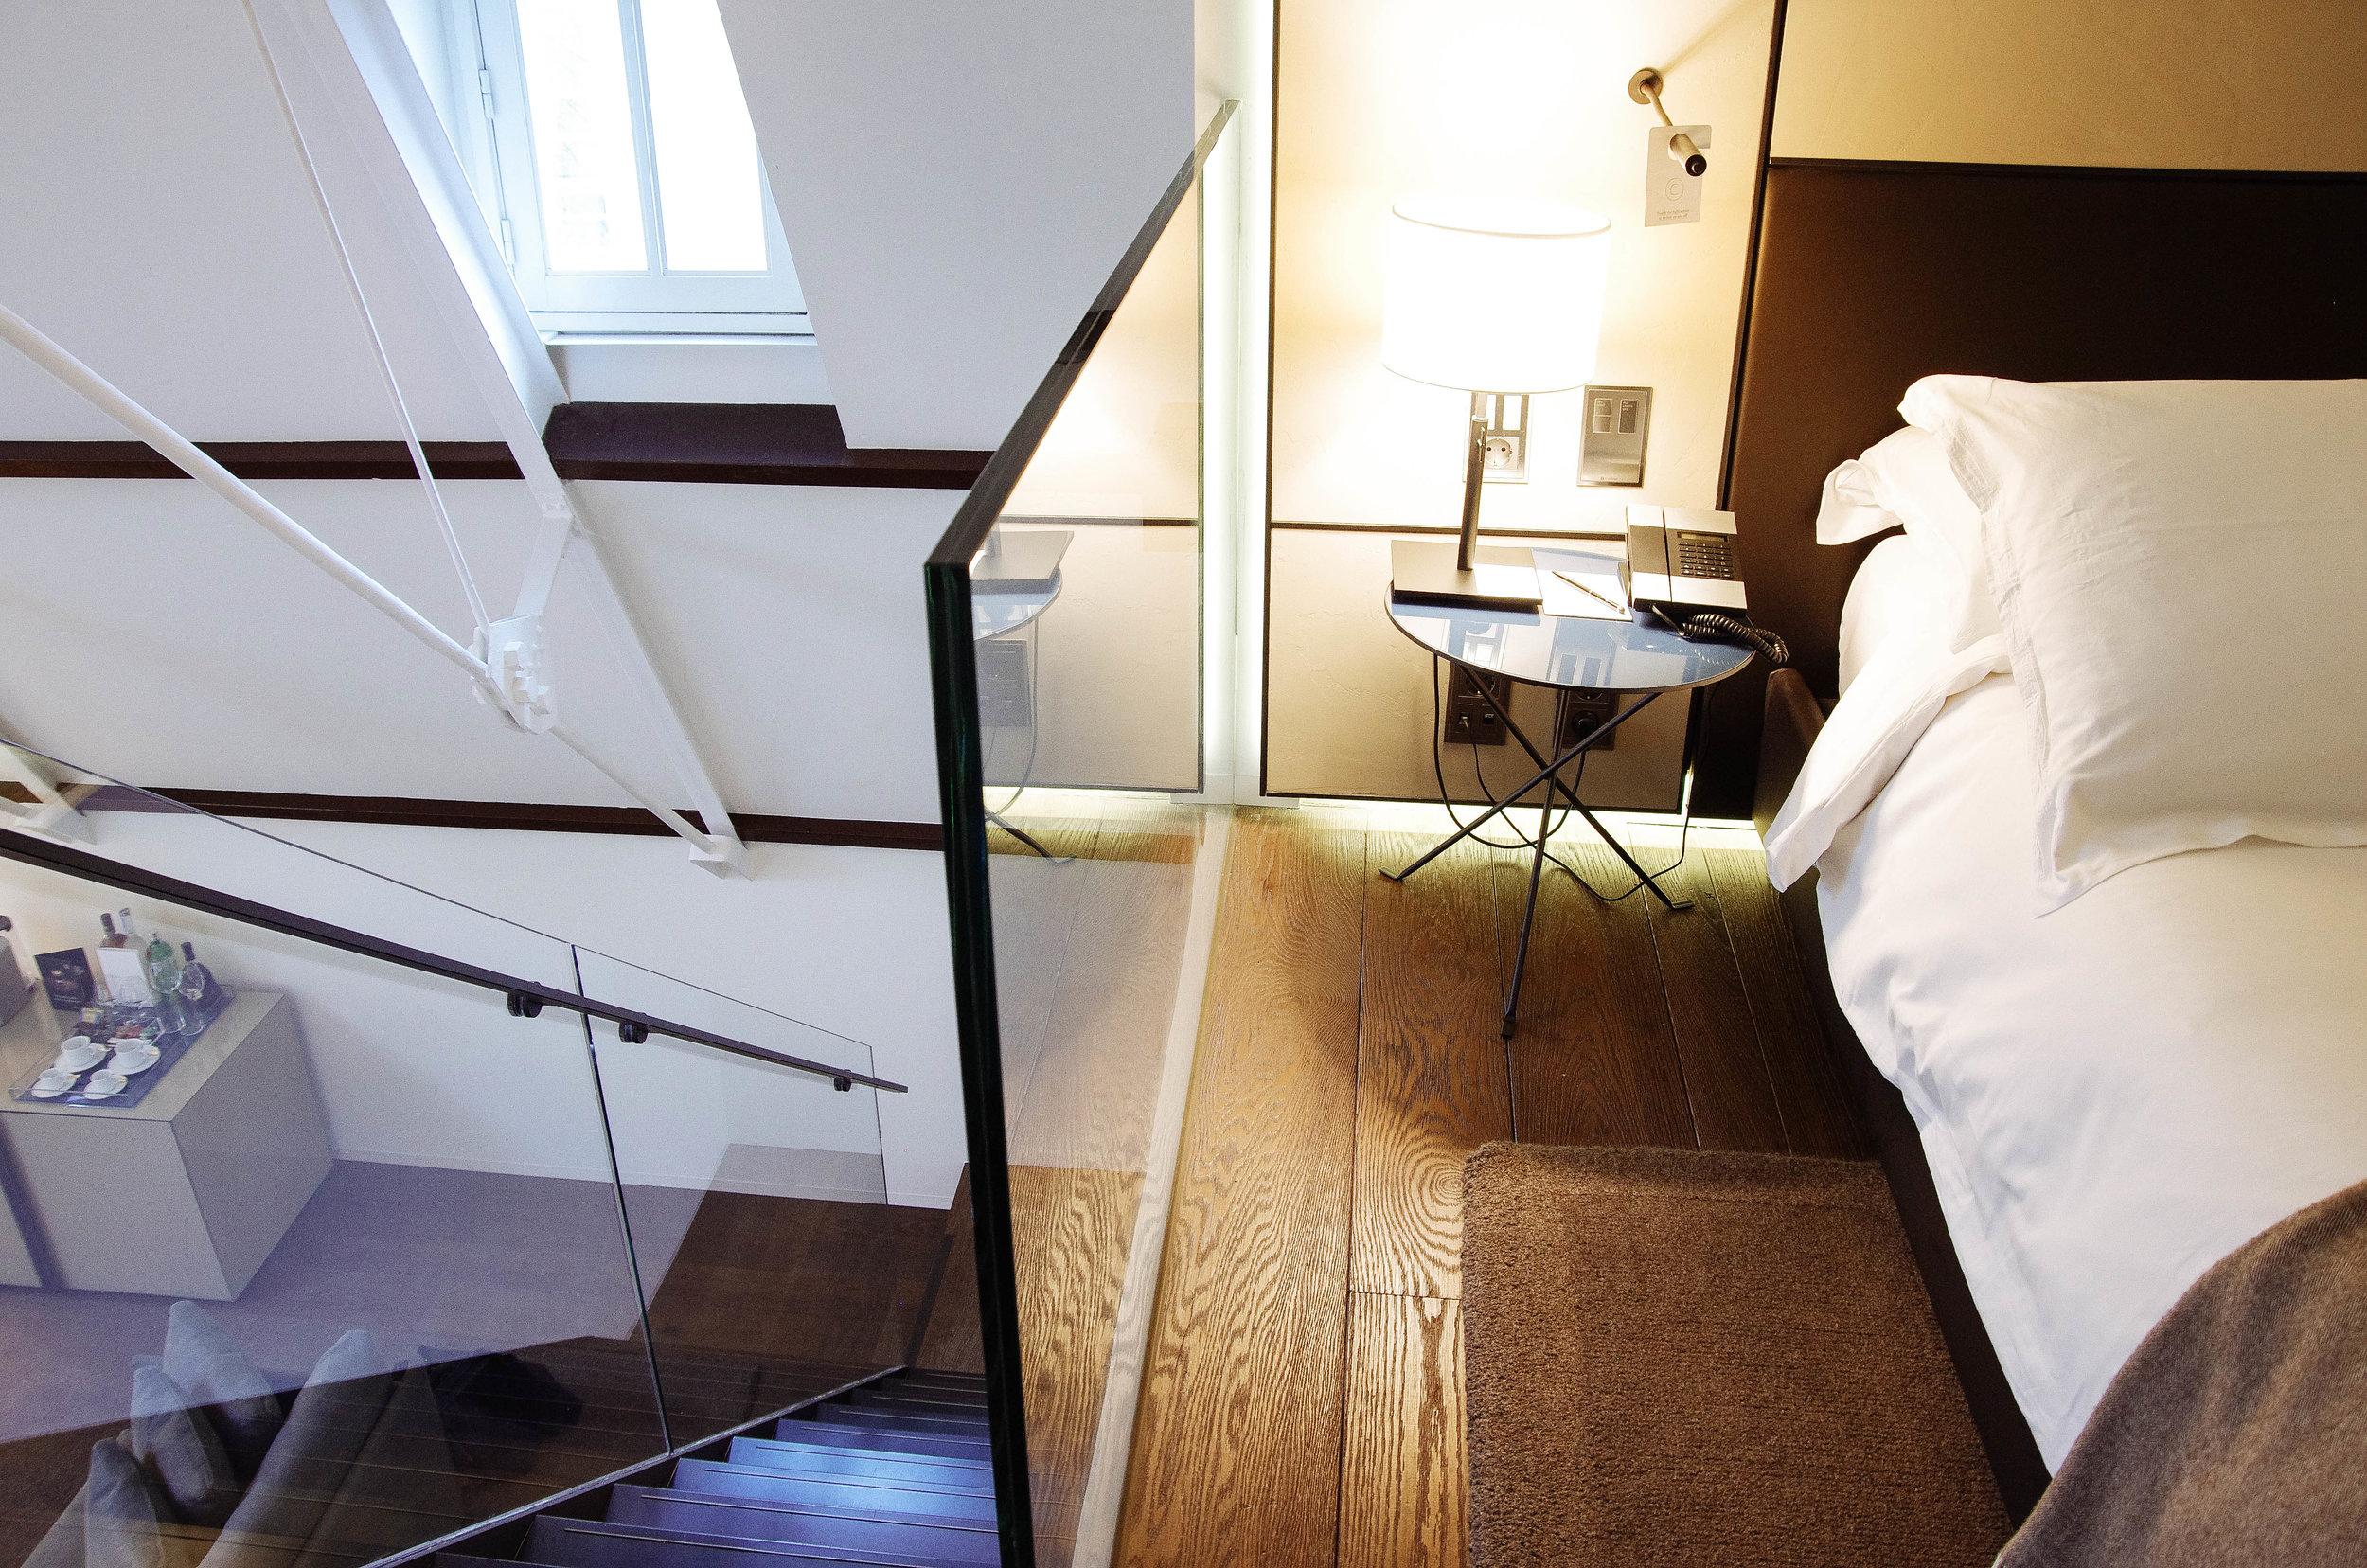 CONSERVATORIUM HOTEL AMSTERDAM - Room details 14.jpg